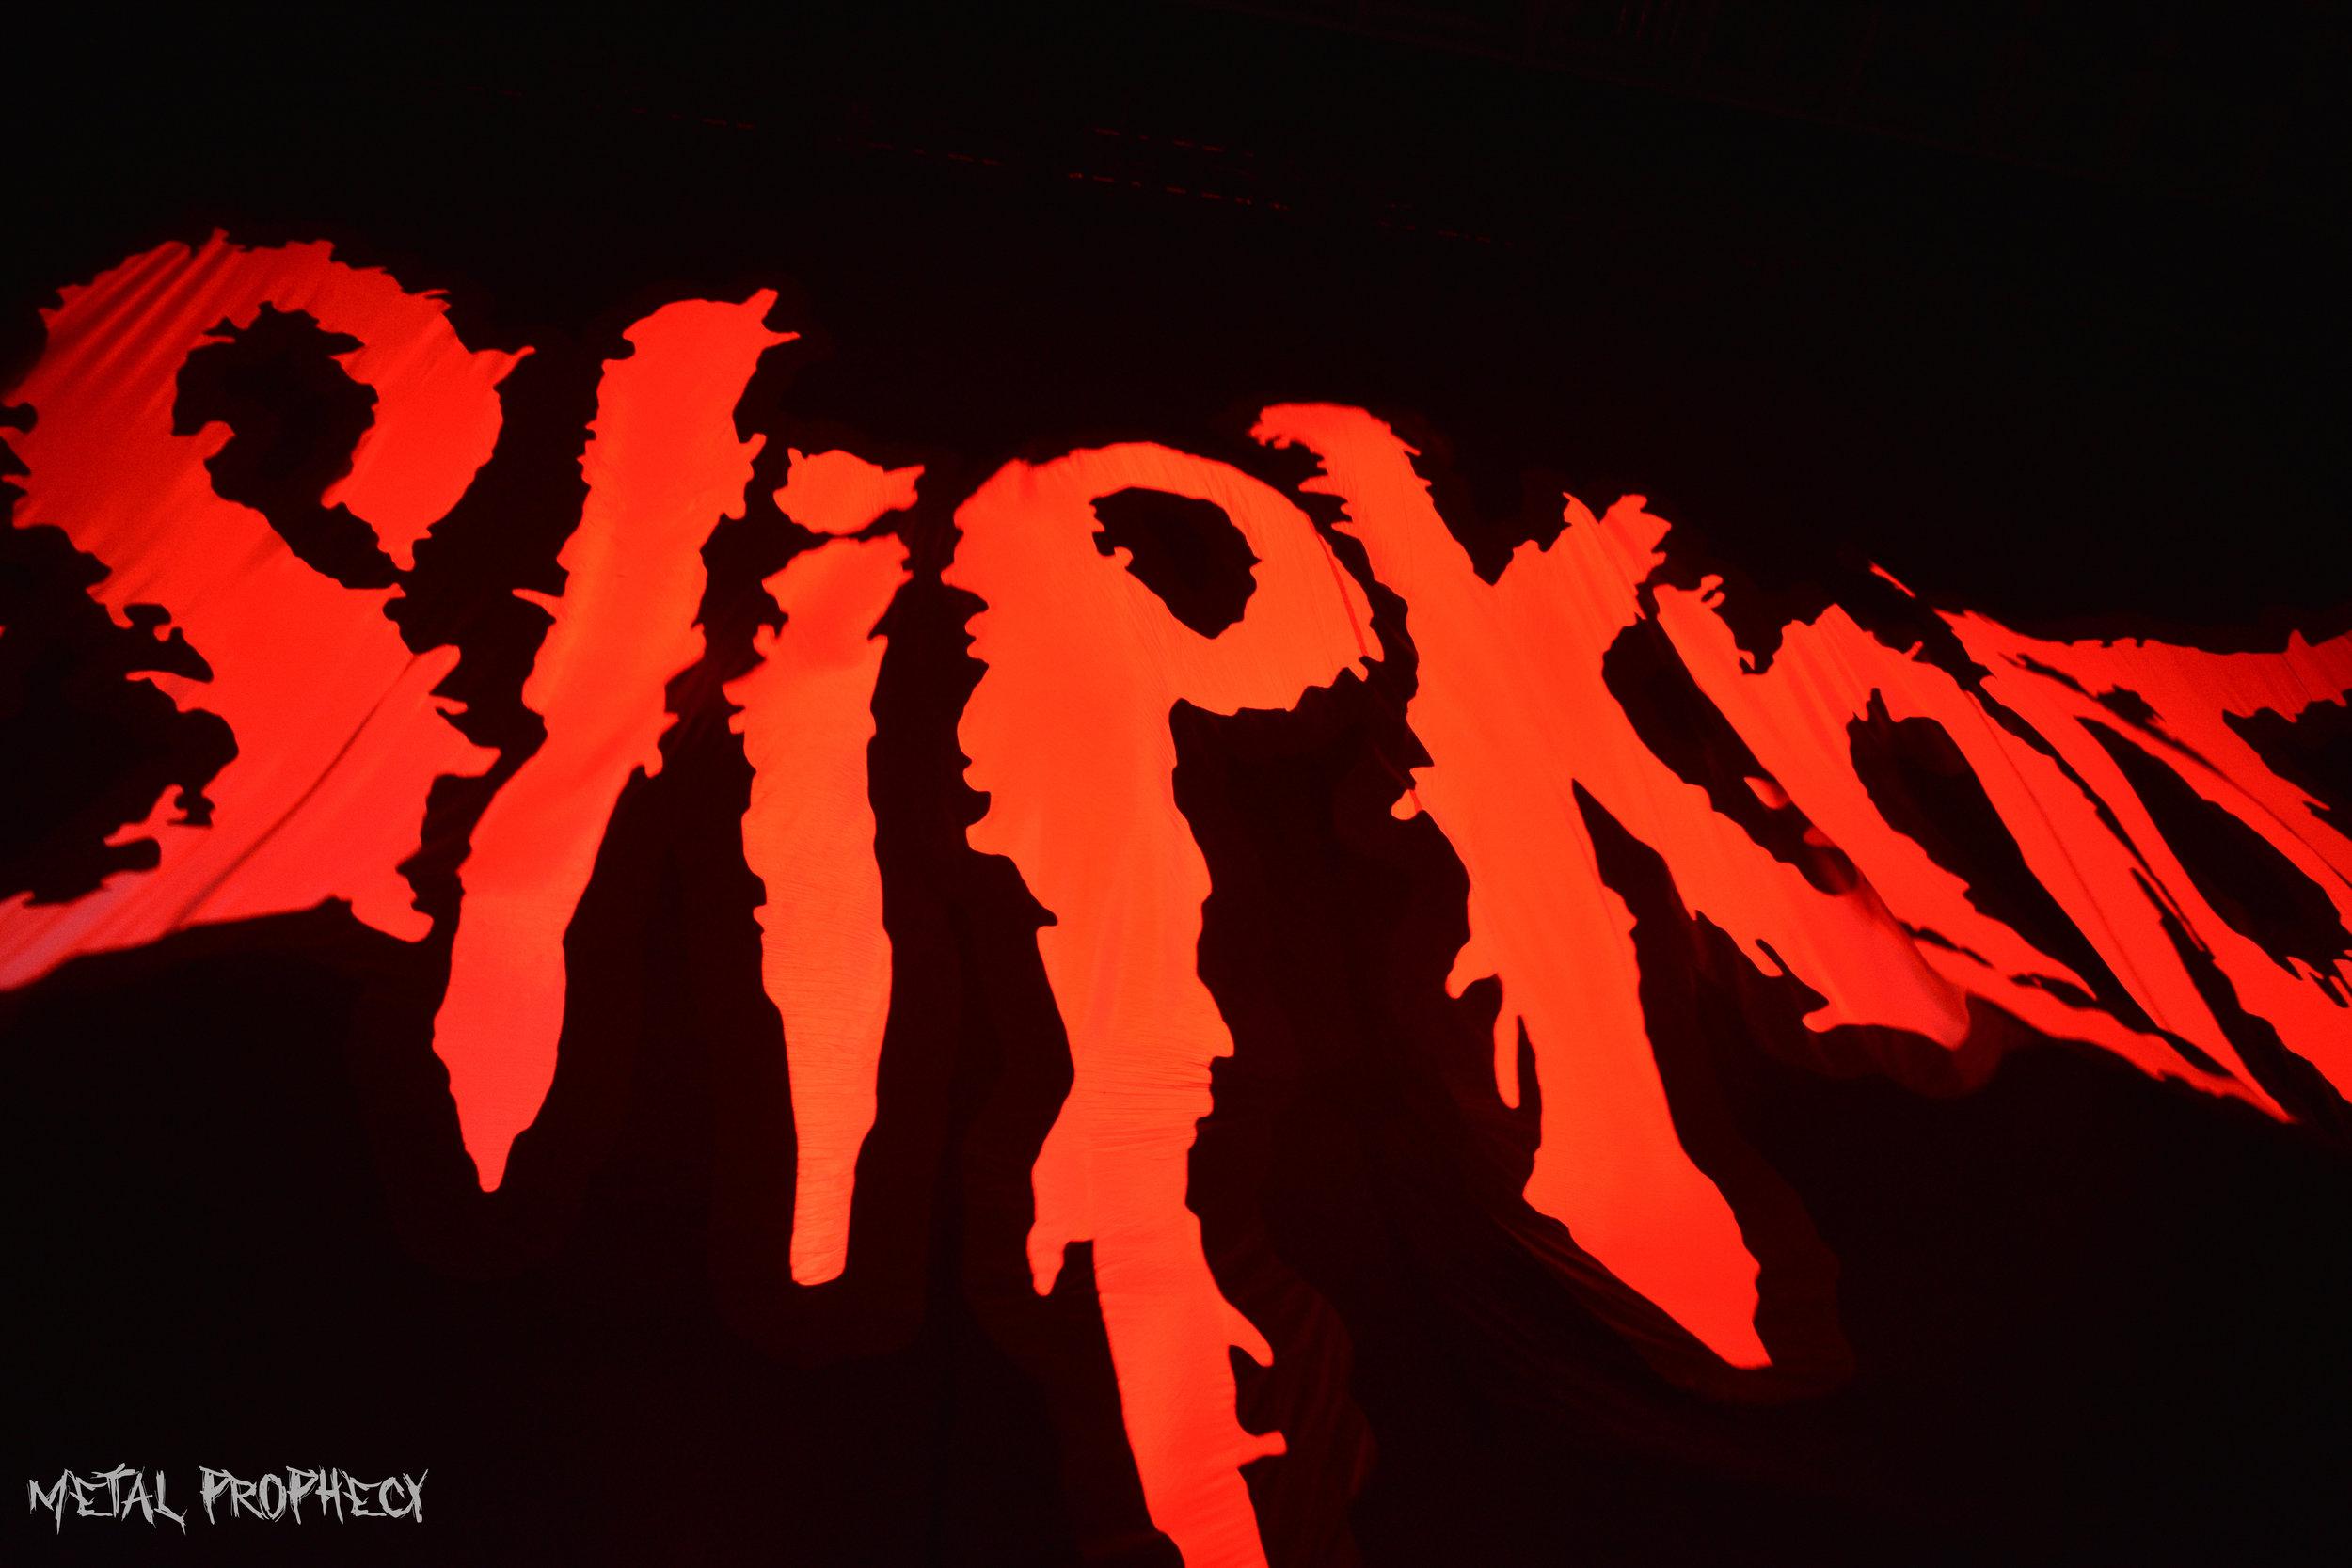 Slipknot at Ameris Bank Amphitheater